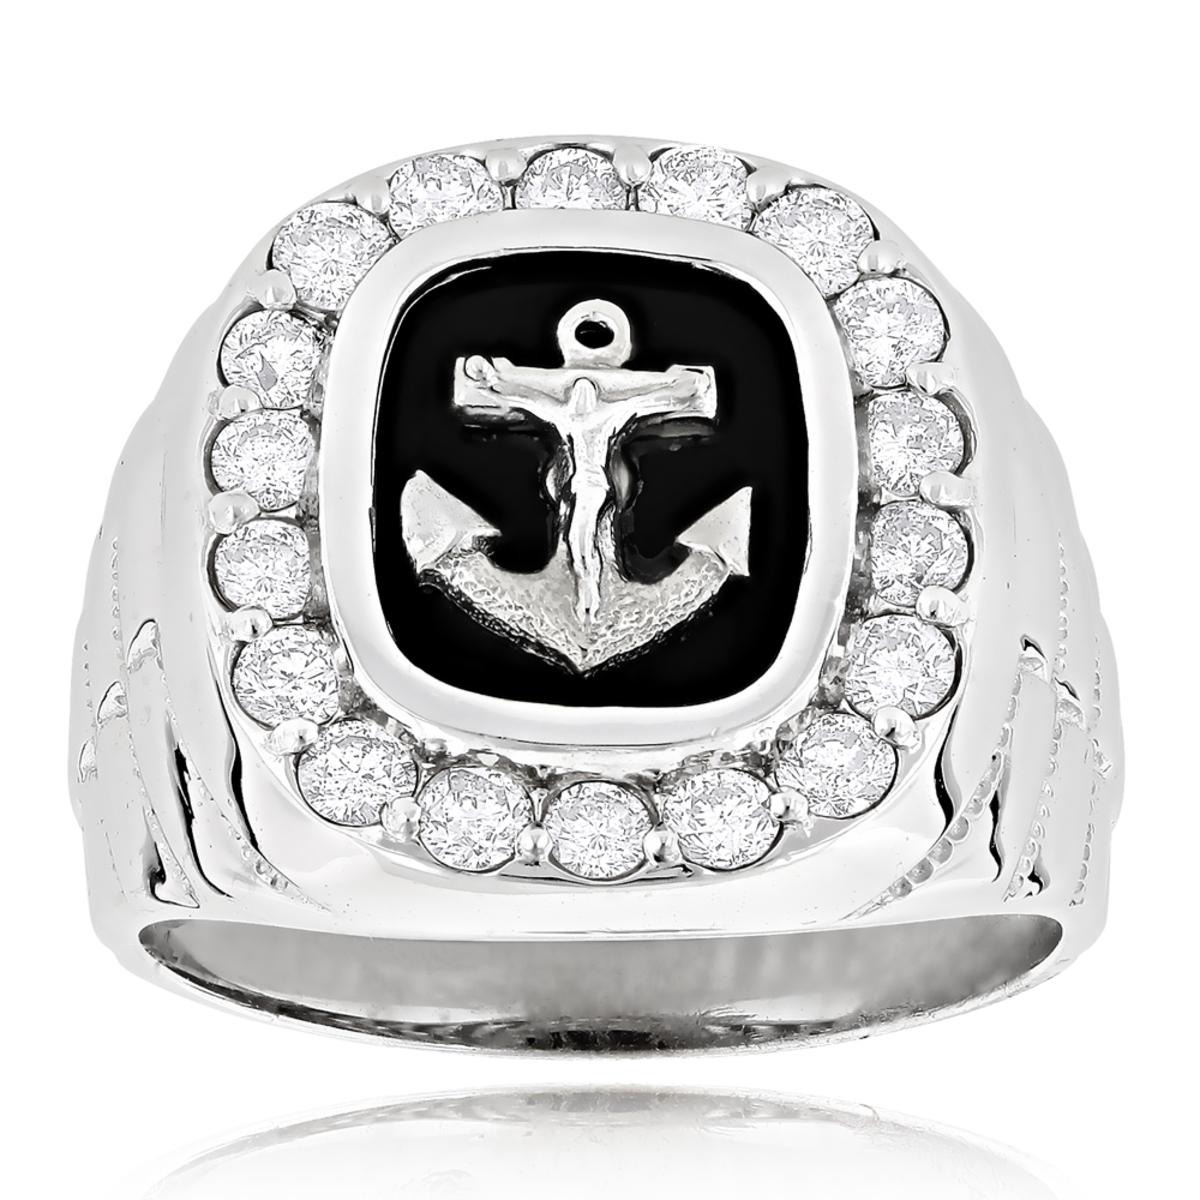 Black Onyx Diamond Rings 14K Gold Anchor Ring 1.50ct